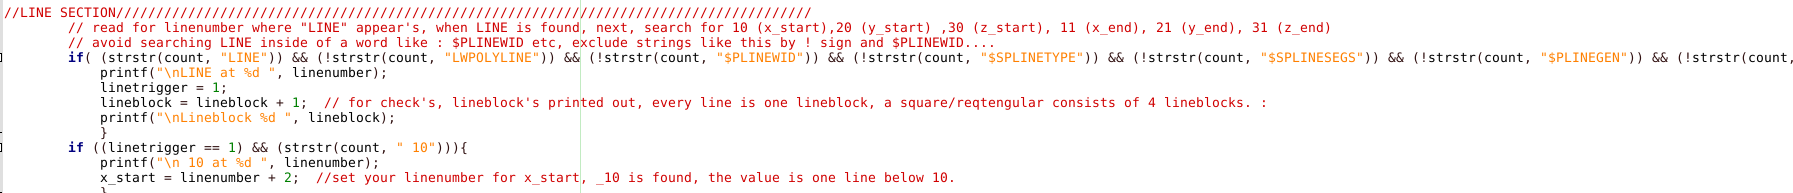 C_coding.png